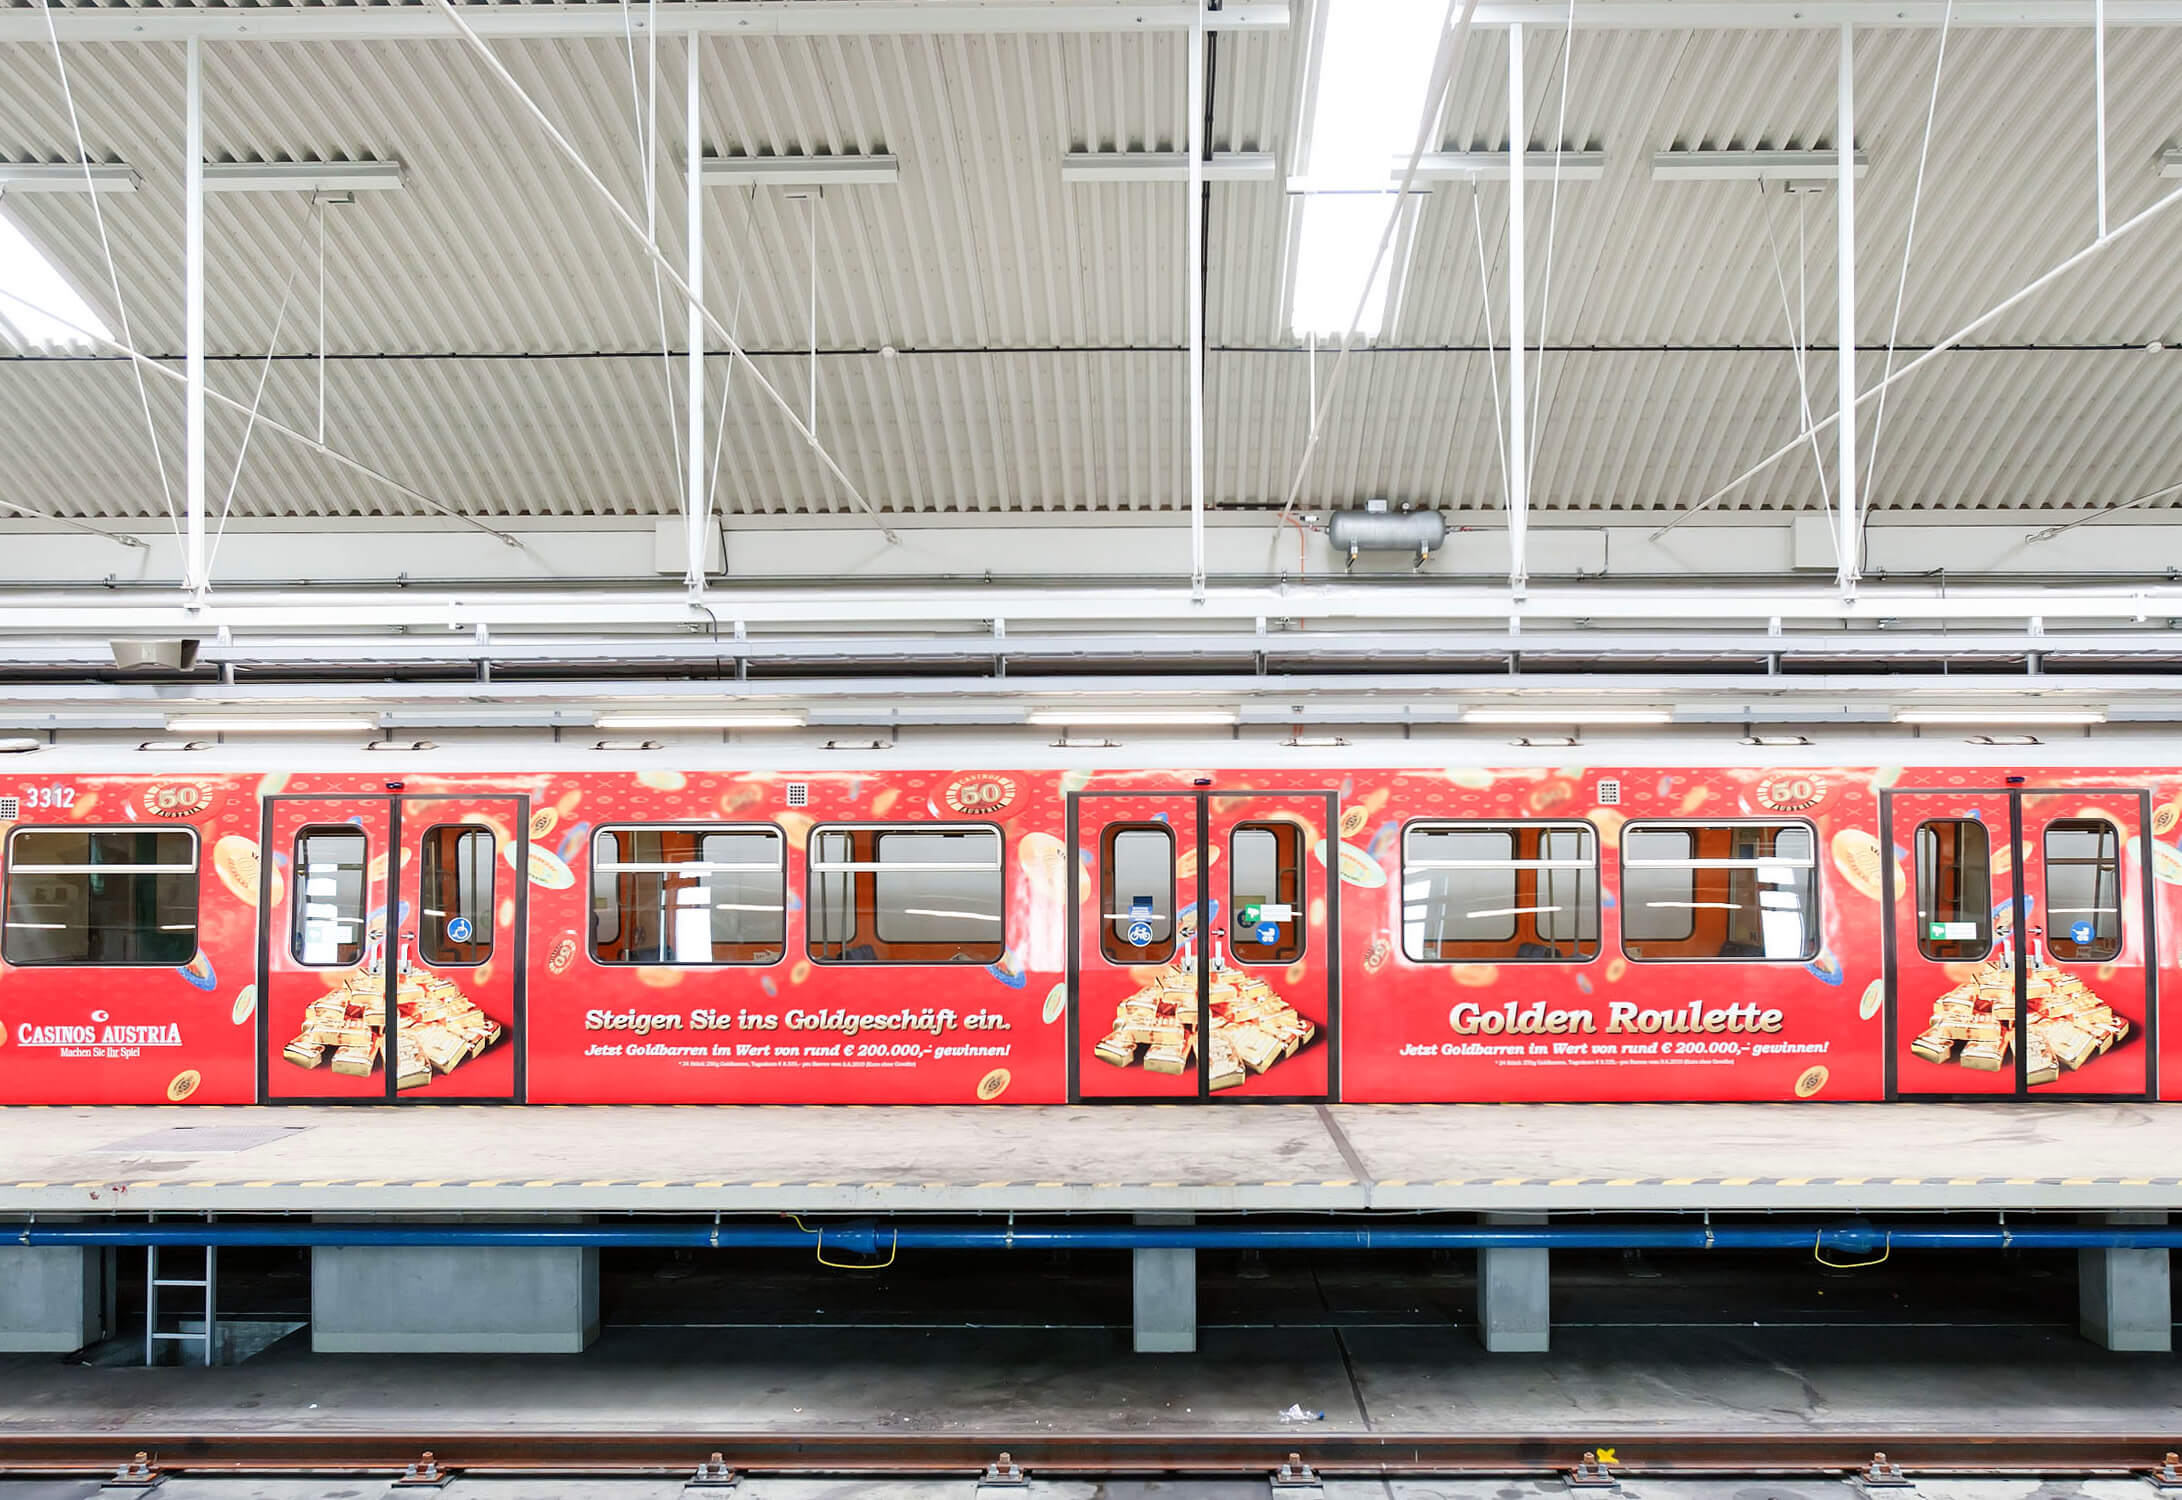 Gewista Stadtwerbung U-Bahn, Bahnsteigtafeln, Werbung Innen, Aussen